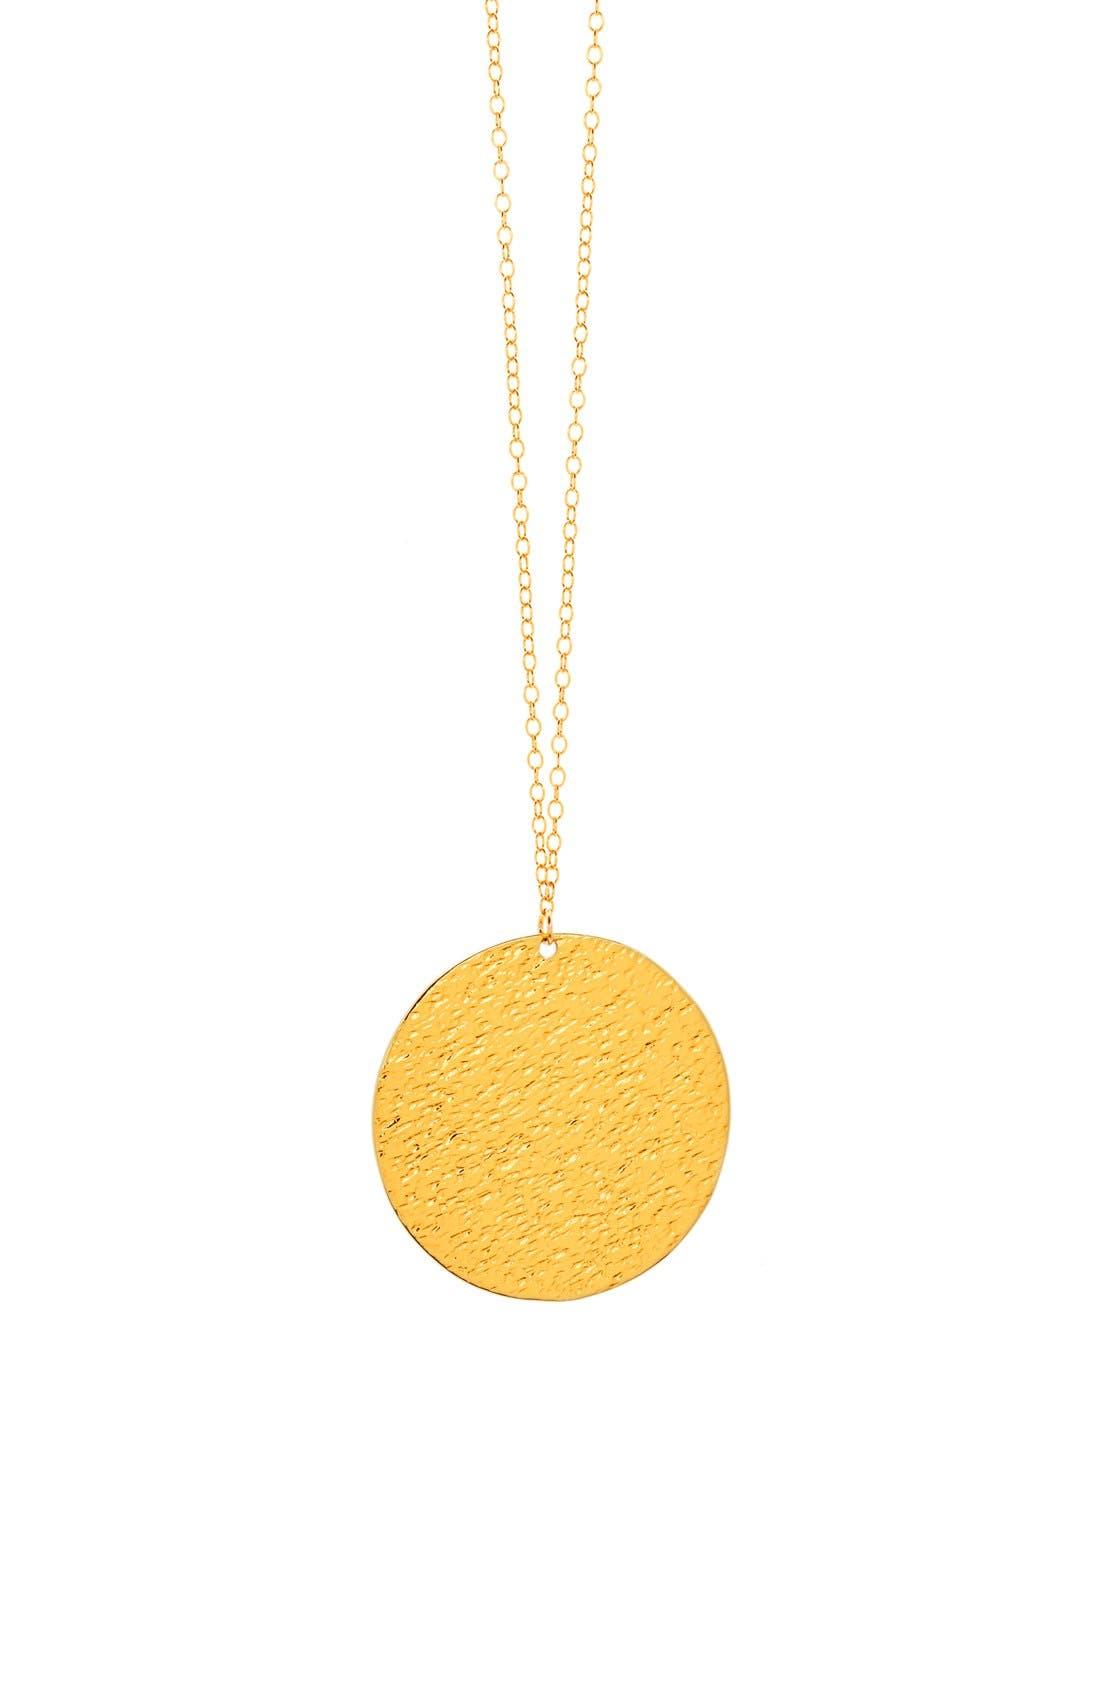 gorjana 'Faye' Pendant Necklace